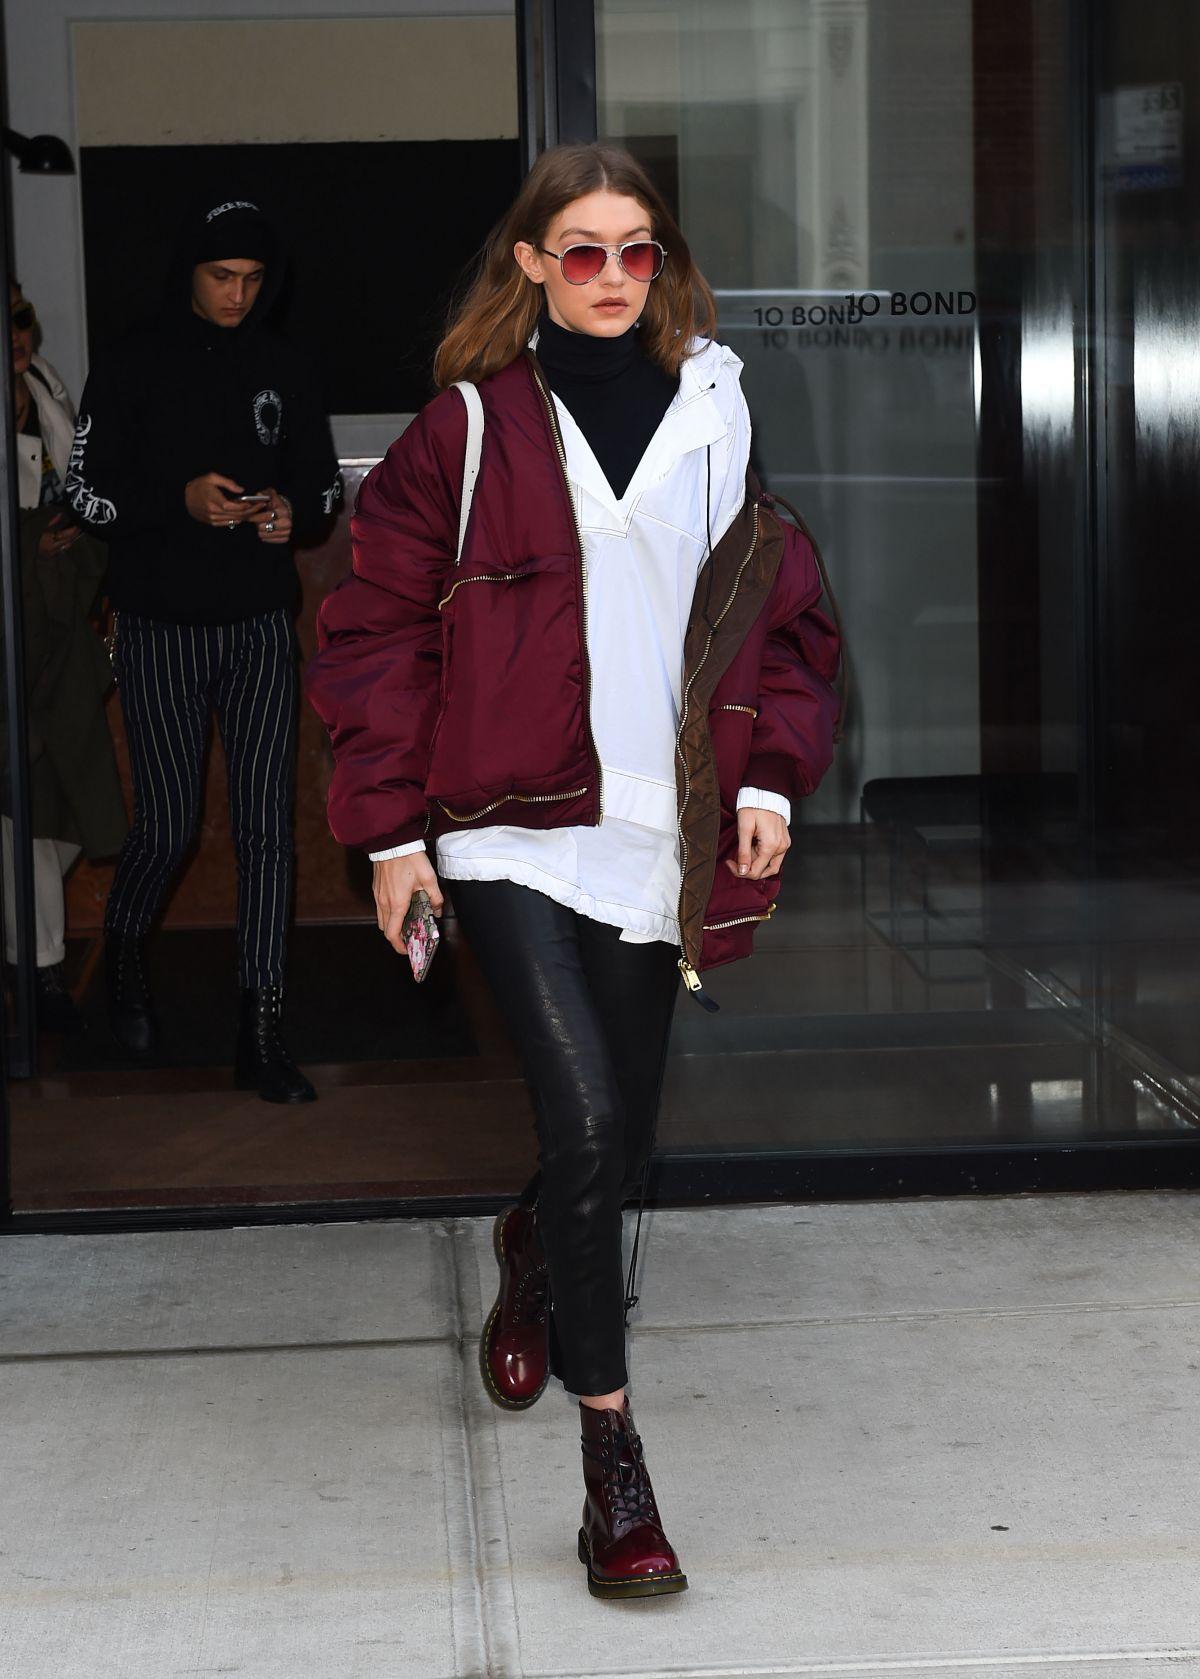 gigi hadid leavies her apartment in new york 02/11/2017